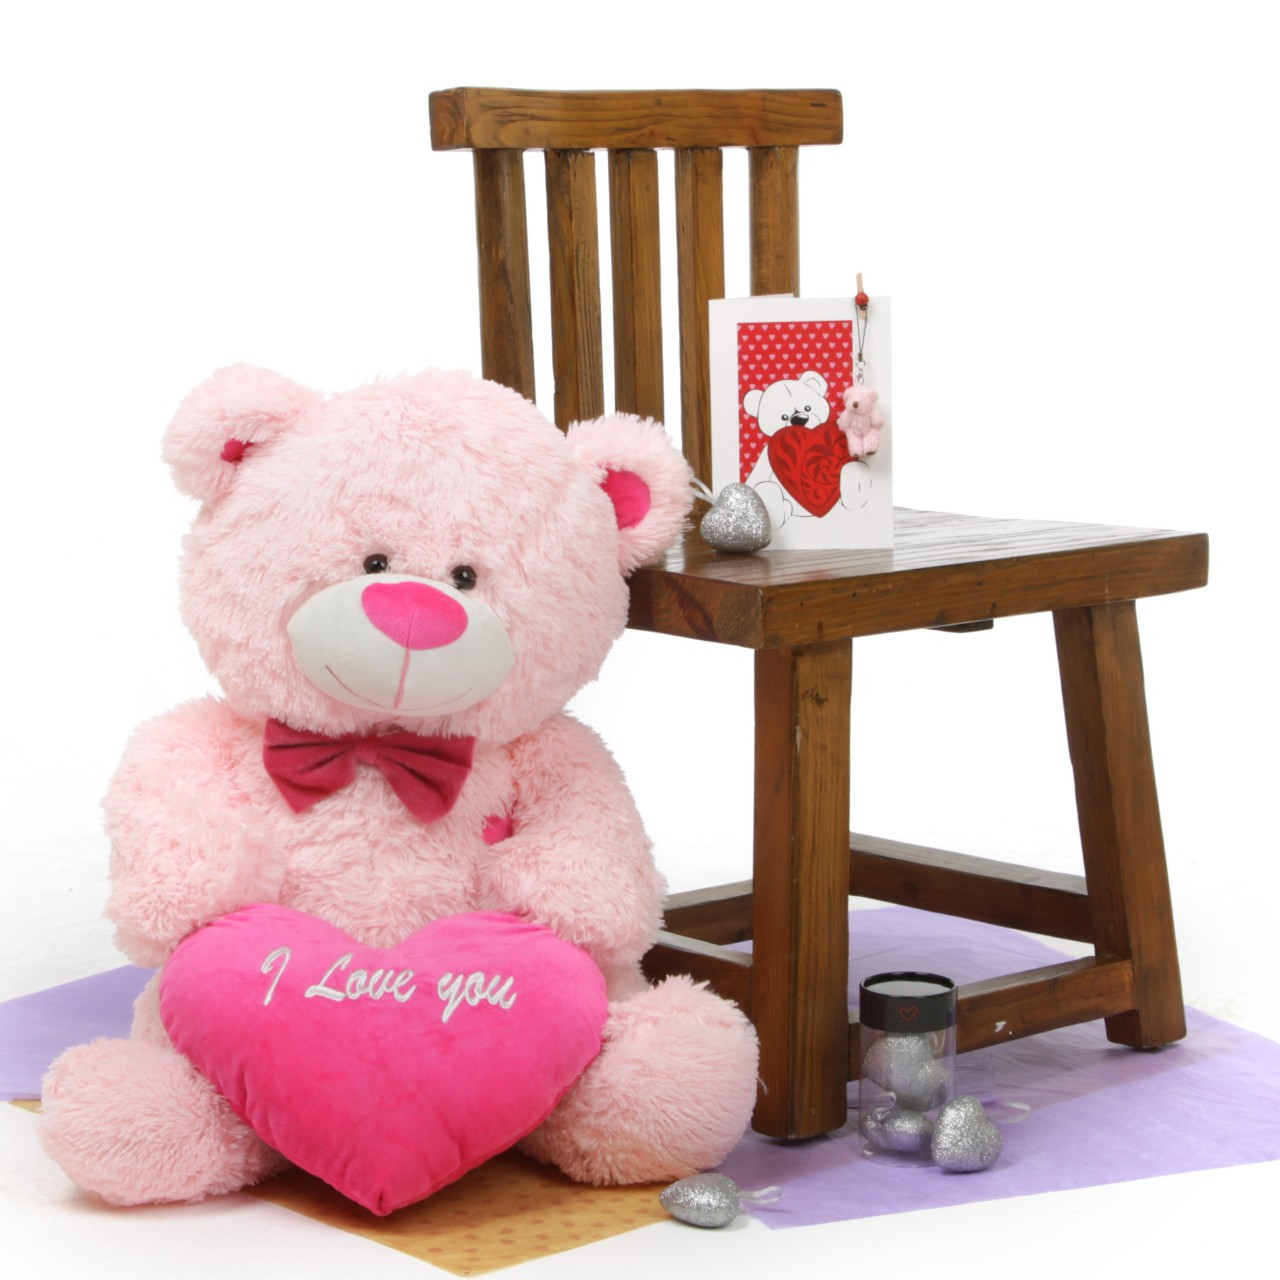 He Loves Me! Bear Hug Care Package featuring LuLu Shags Pink 30in